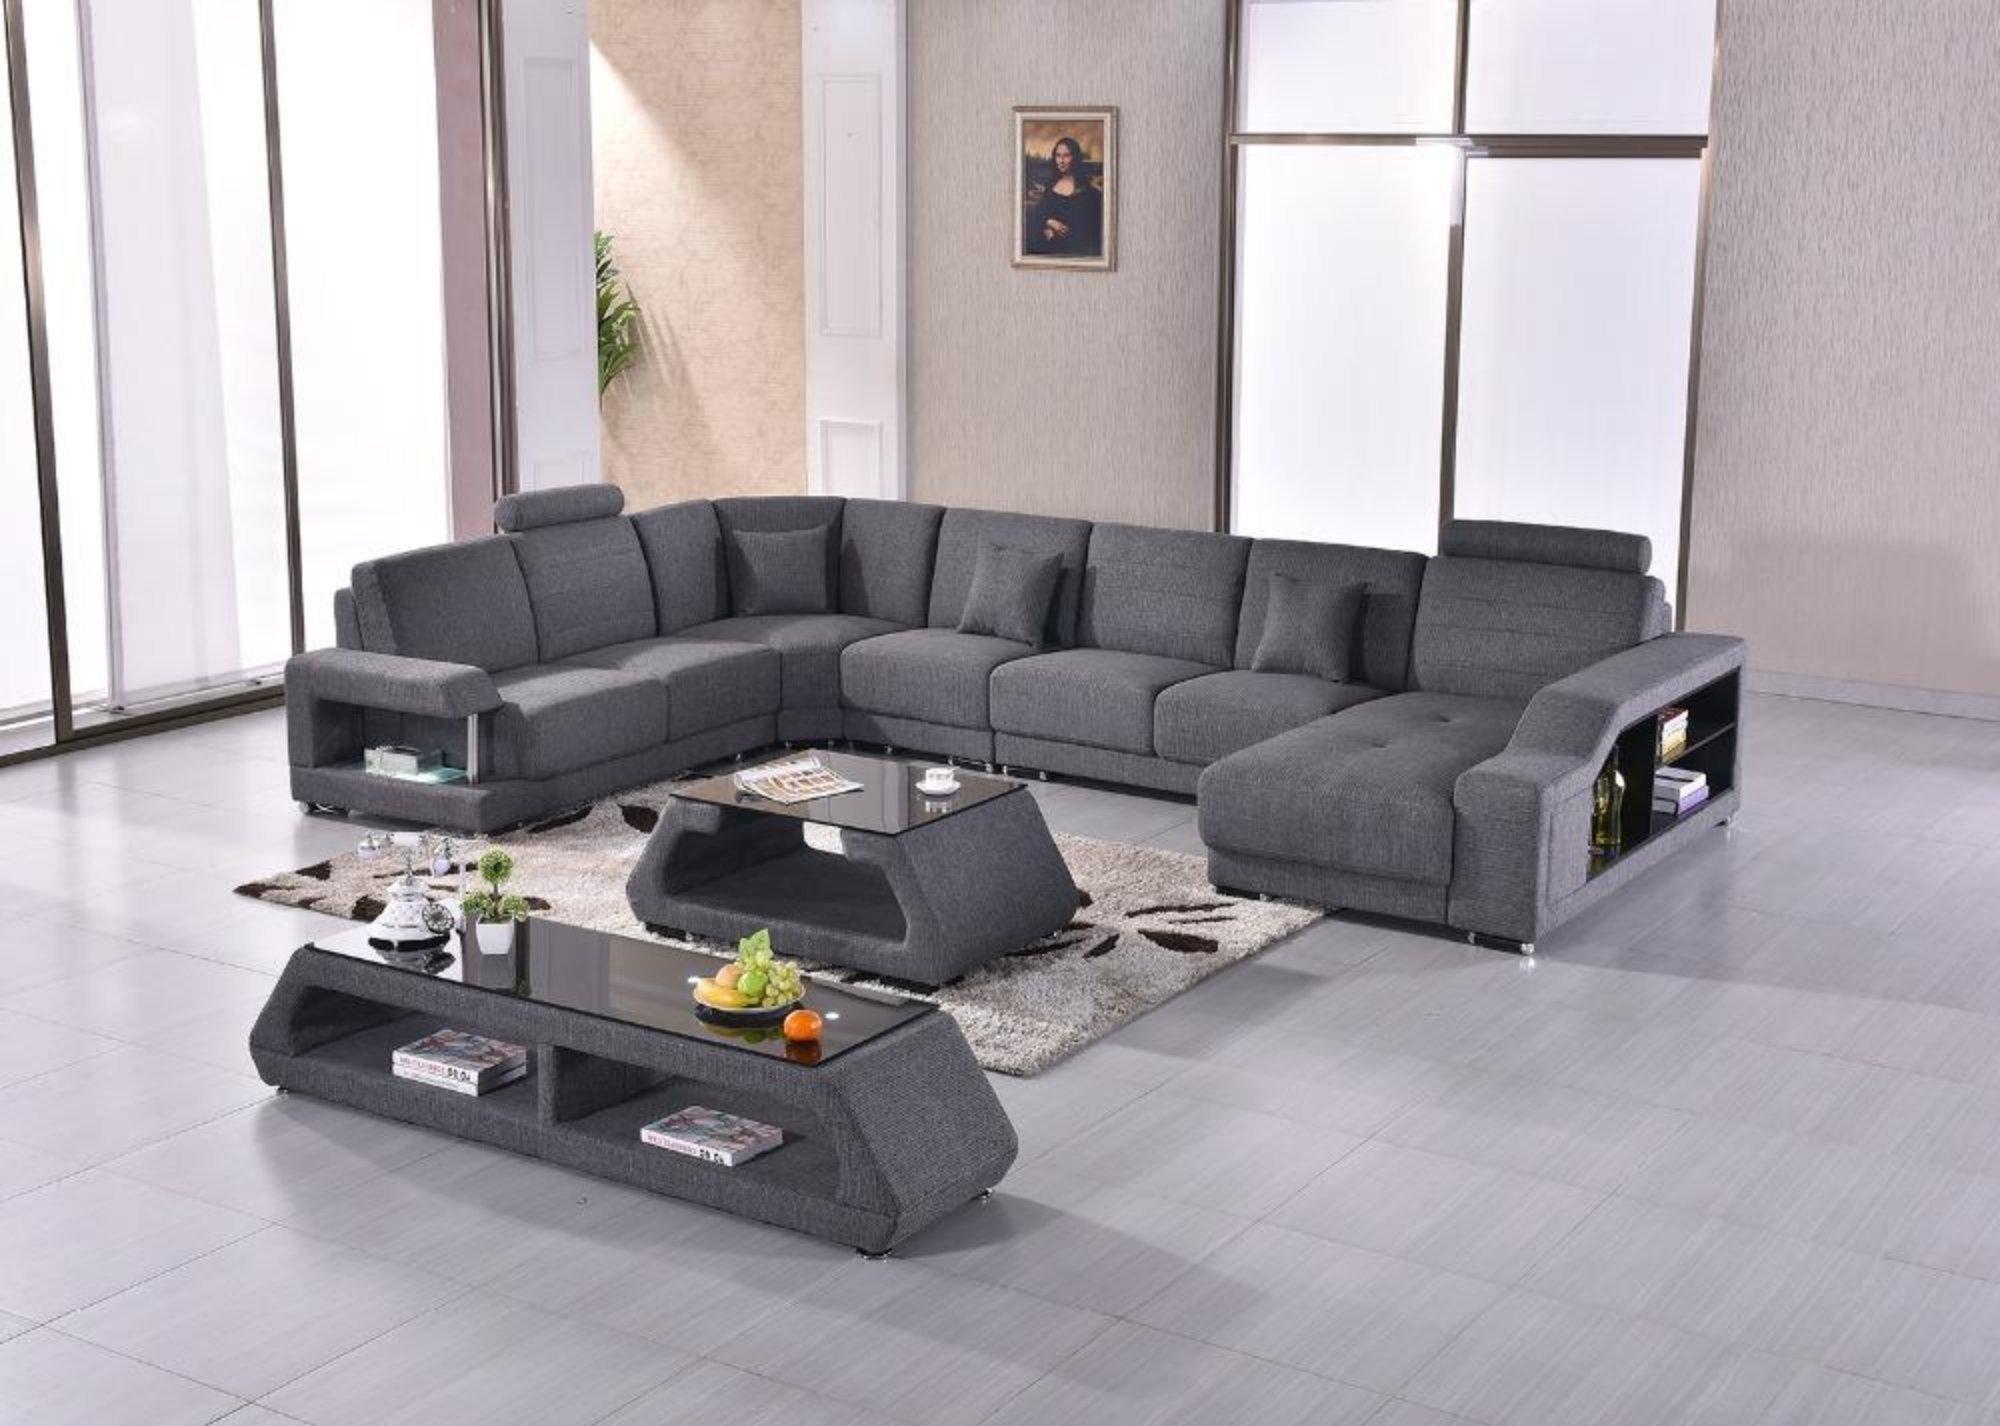 Fabric Modern Sofa Set Armchair Sectional Sofa U Shape Living Room